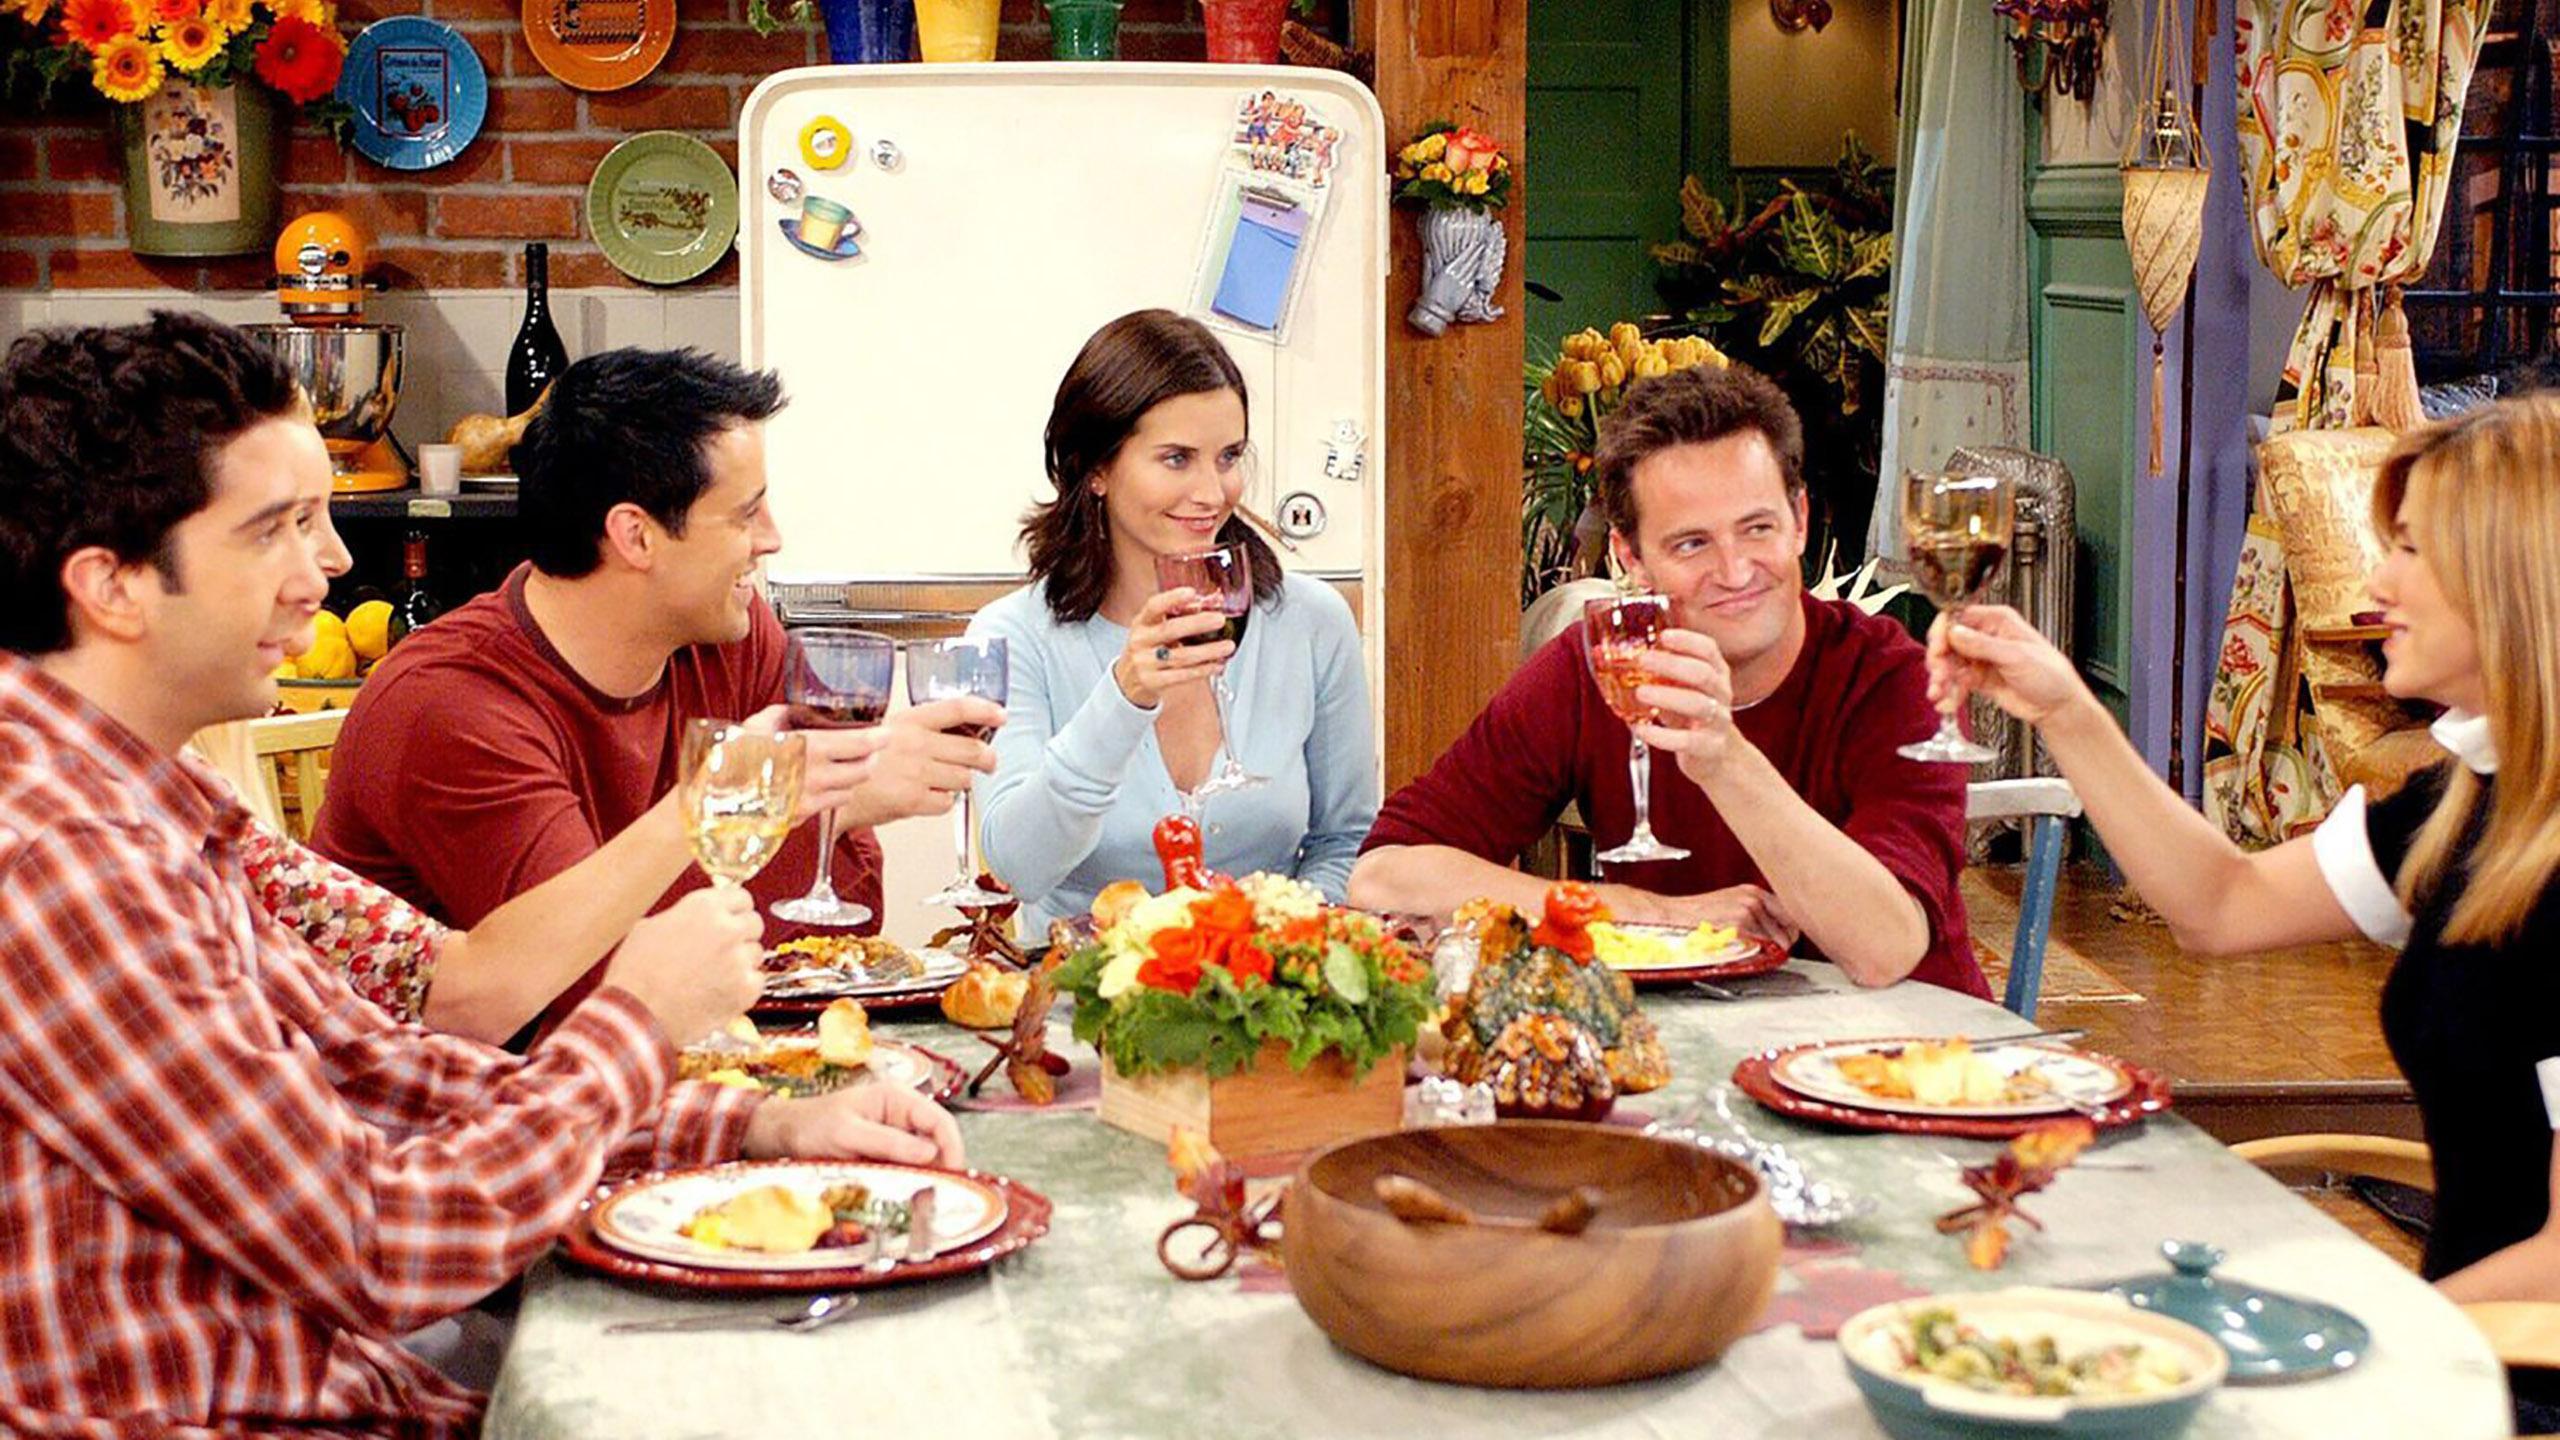 serie de televisión, Friends, libro de cocina